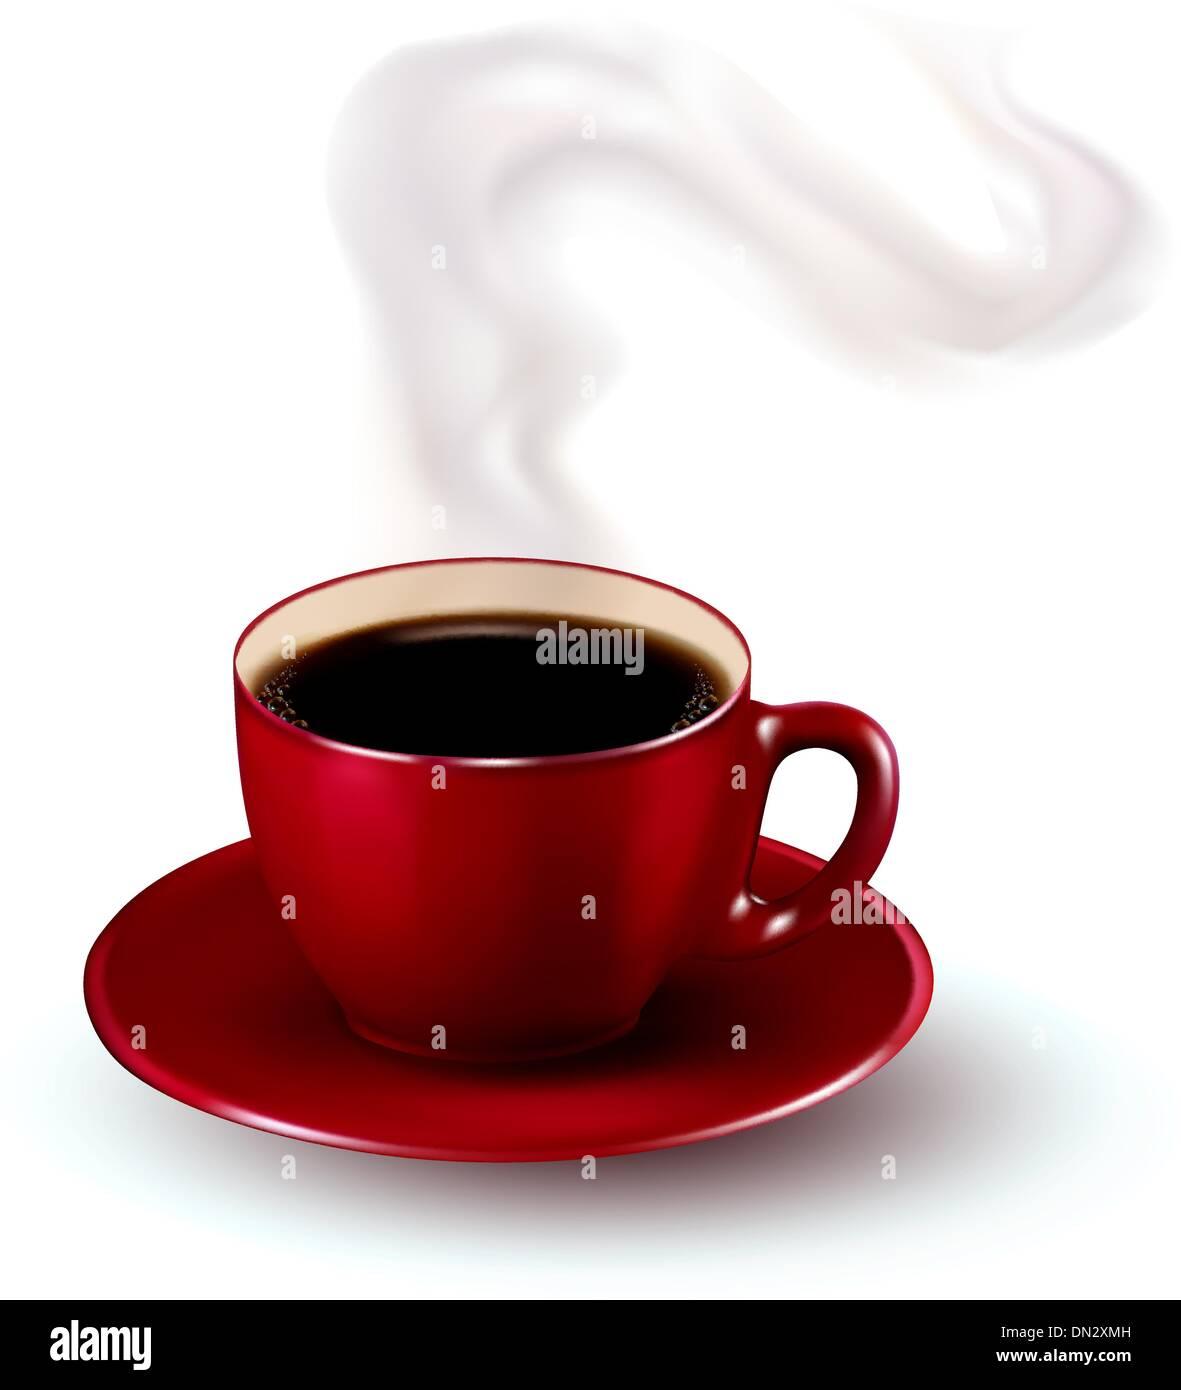 Perfekte rote Tasse Kaffee mit Dampf. Vektor-Illustration. Stockbild